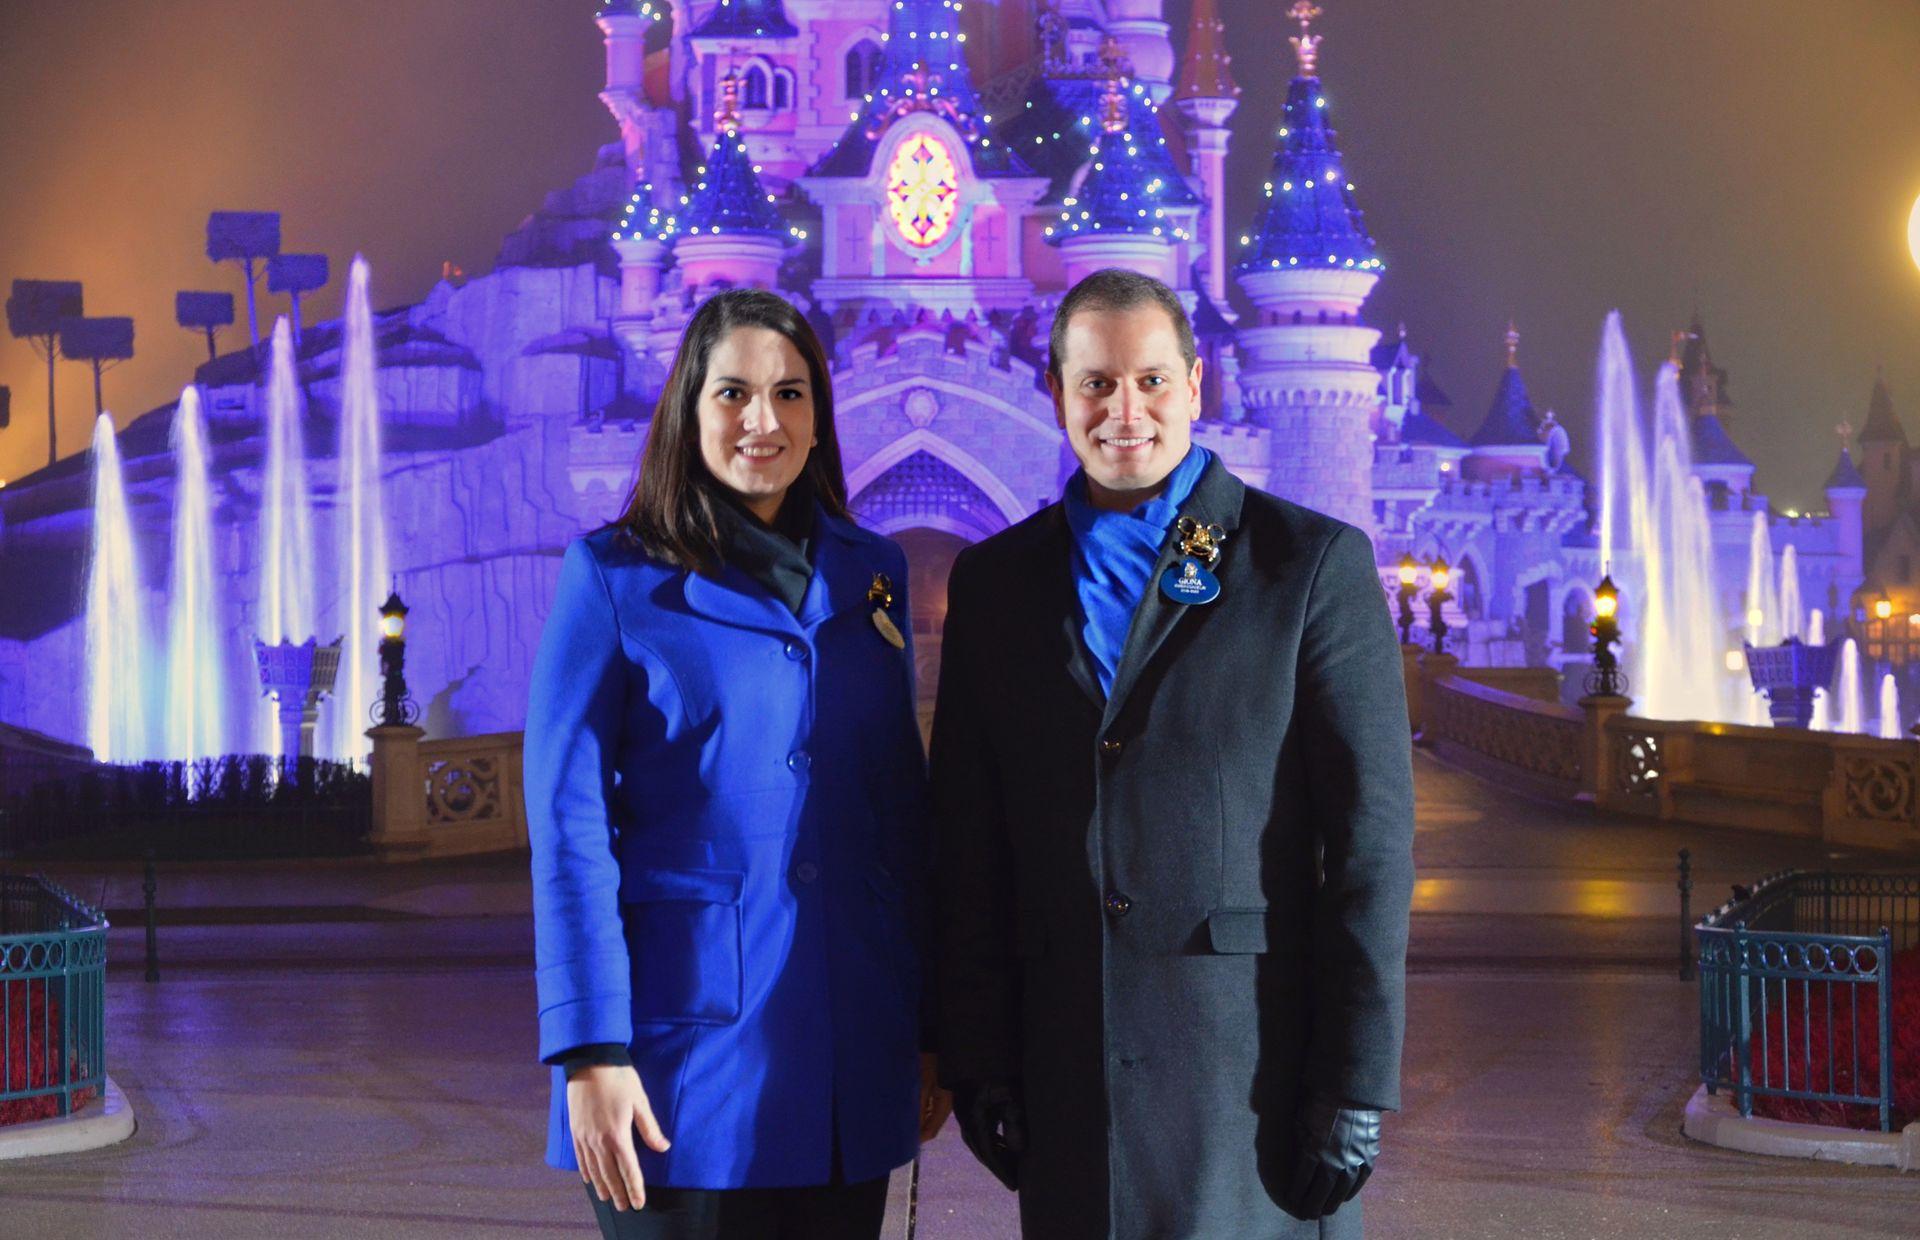 Ambasciatori Disneyland Paris 2019 - 2020 - Pagina 2 Hd192013